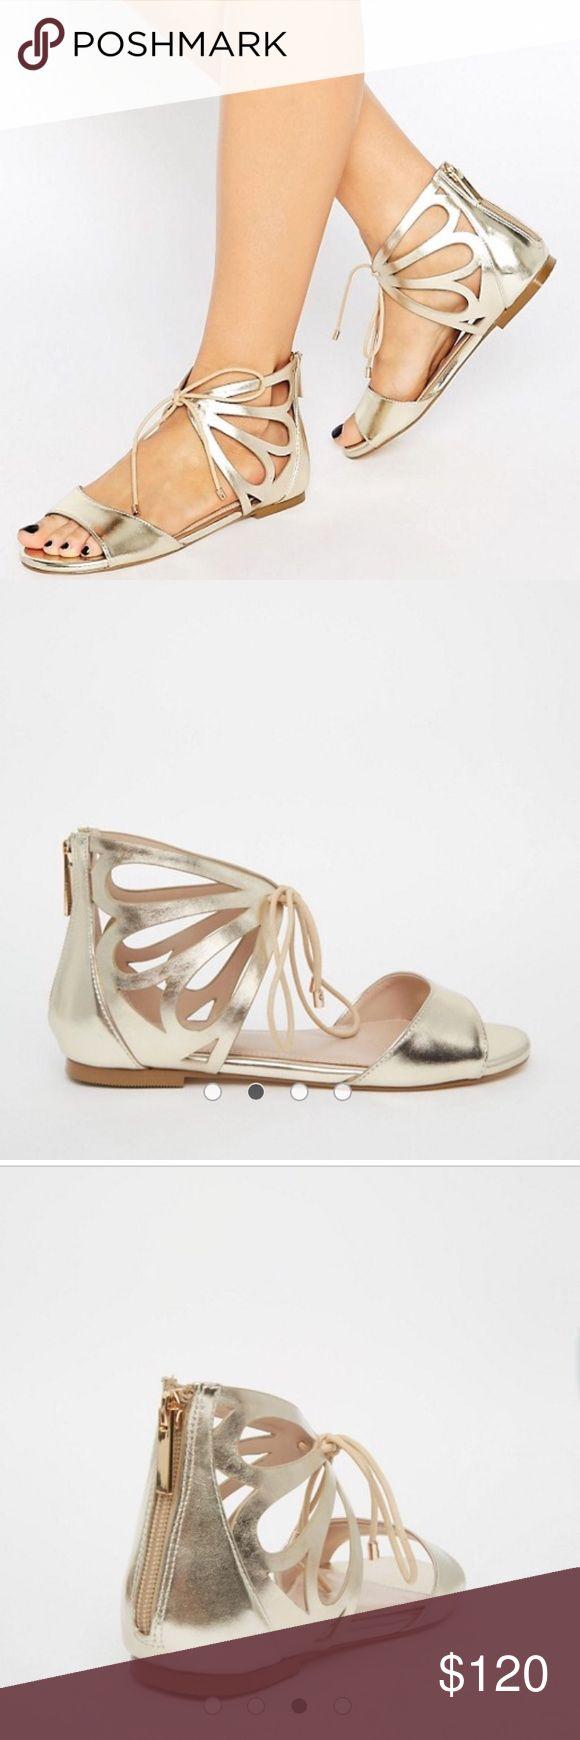 ASOS Carvela Bali Ankle Tie Flat Sandals ASOS Carvela Bali Ankle Tie Flat Sandals ASOS Shoes